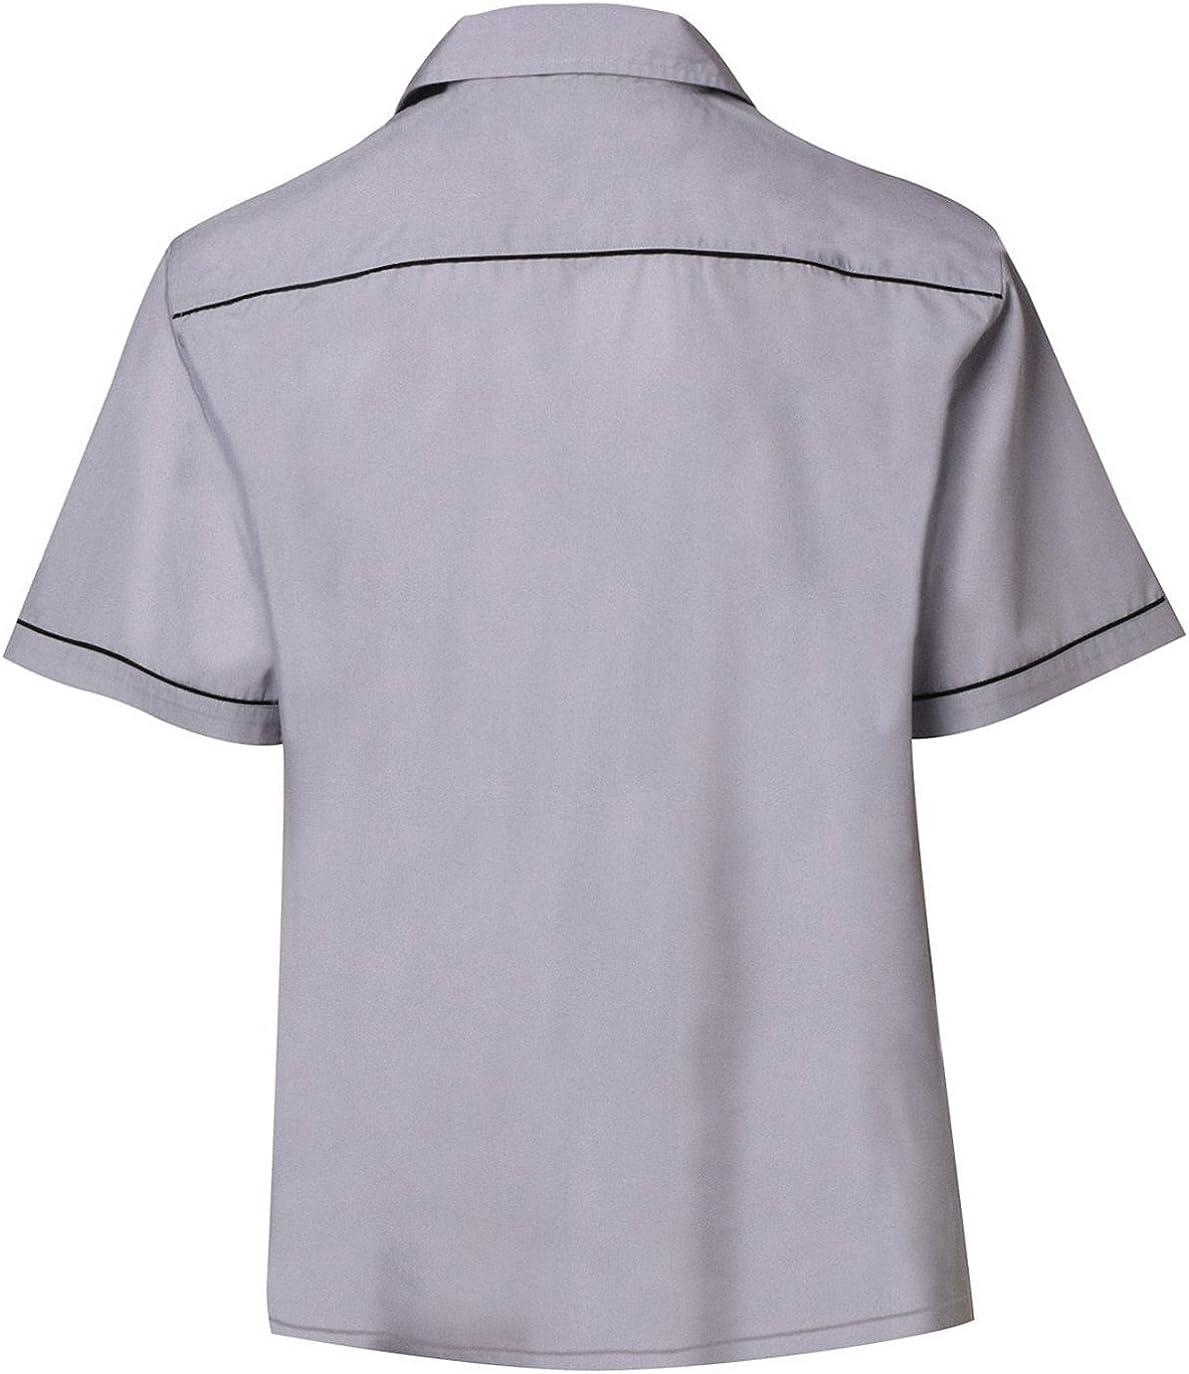 David Carey Mopar Pentastar Work Shirt